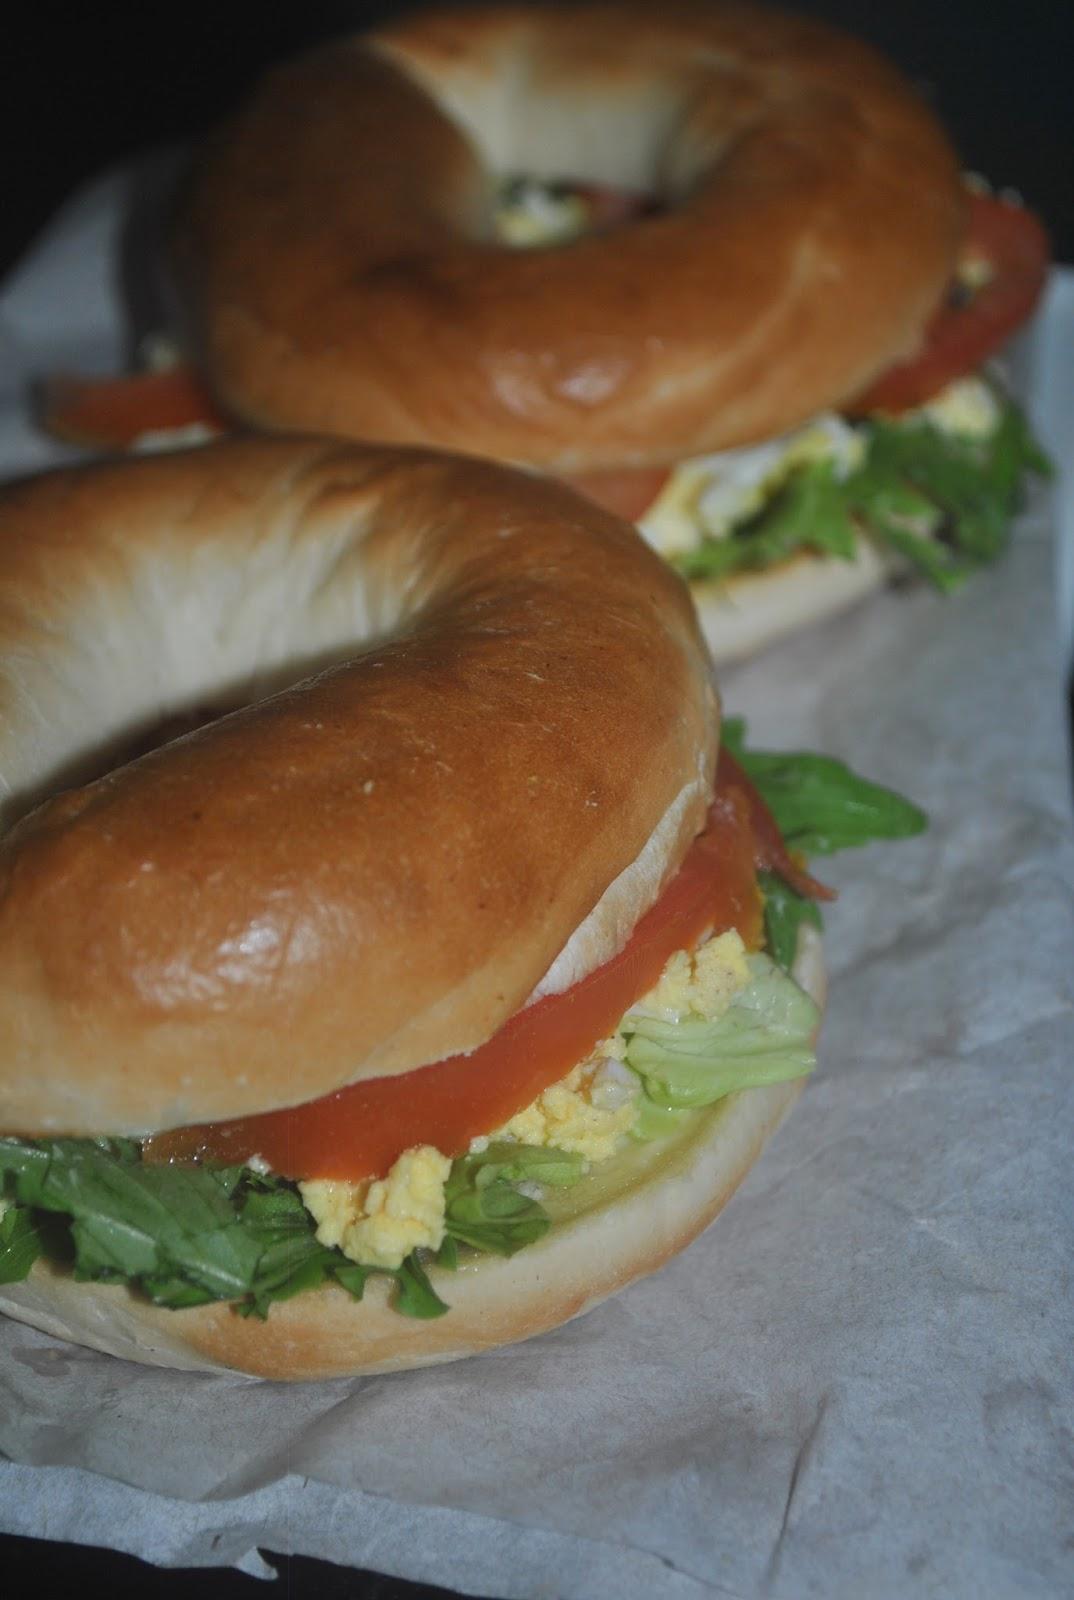 PATYSKITCHEN: EGG BAGEL SANDWICH